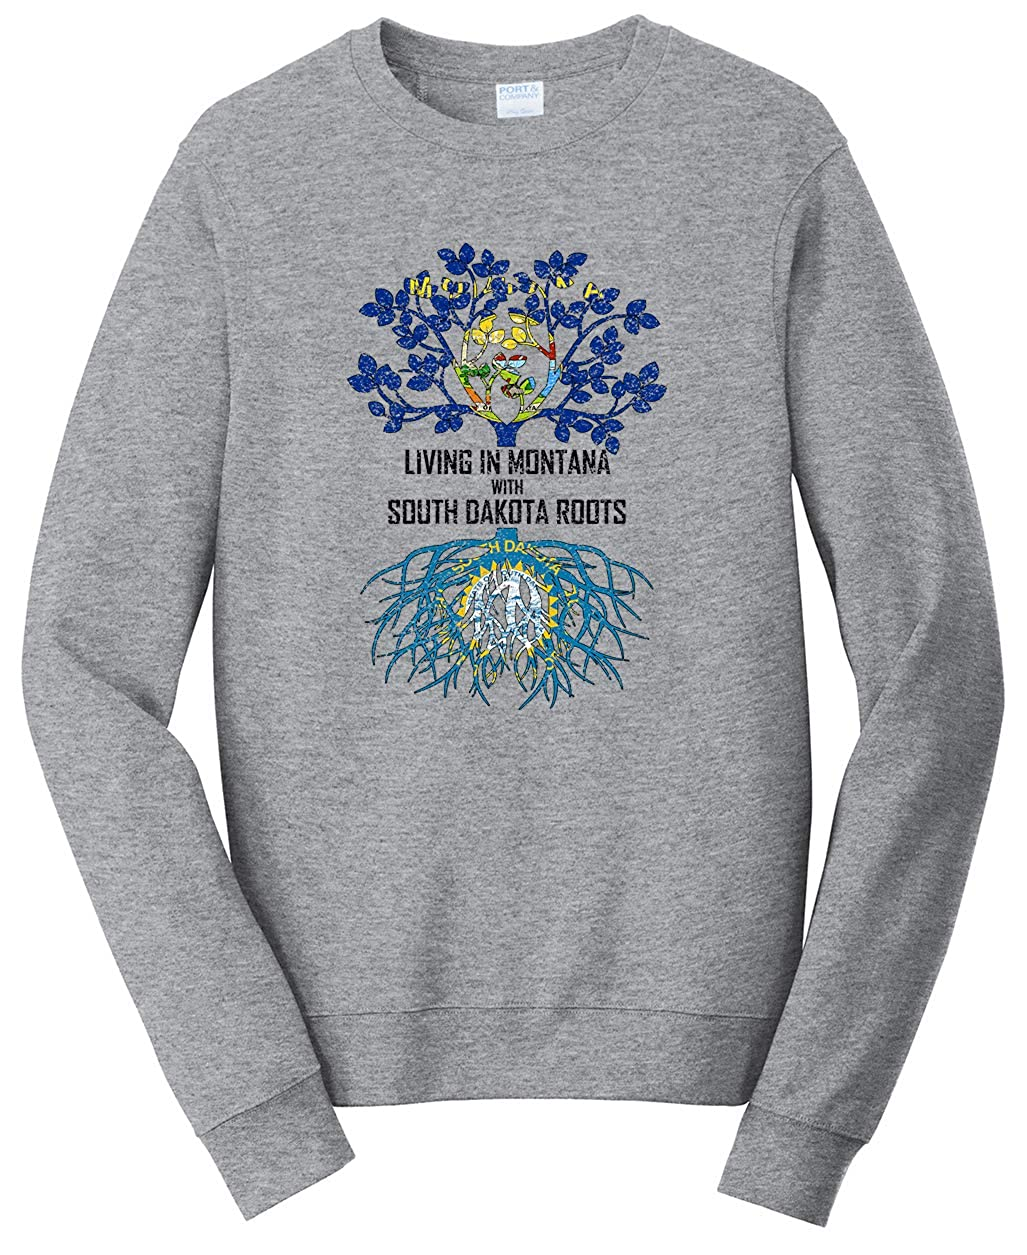 Tenacitee Unisex Living in Montana South Dakota Roots Sweatshirt